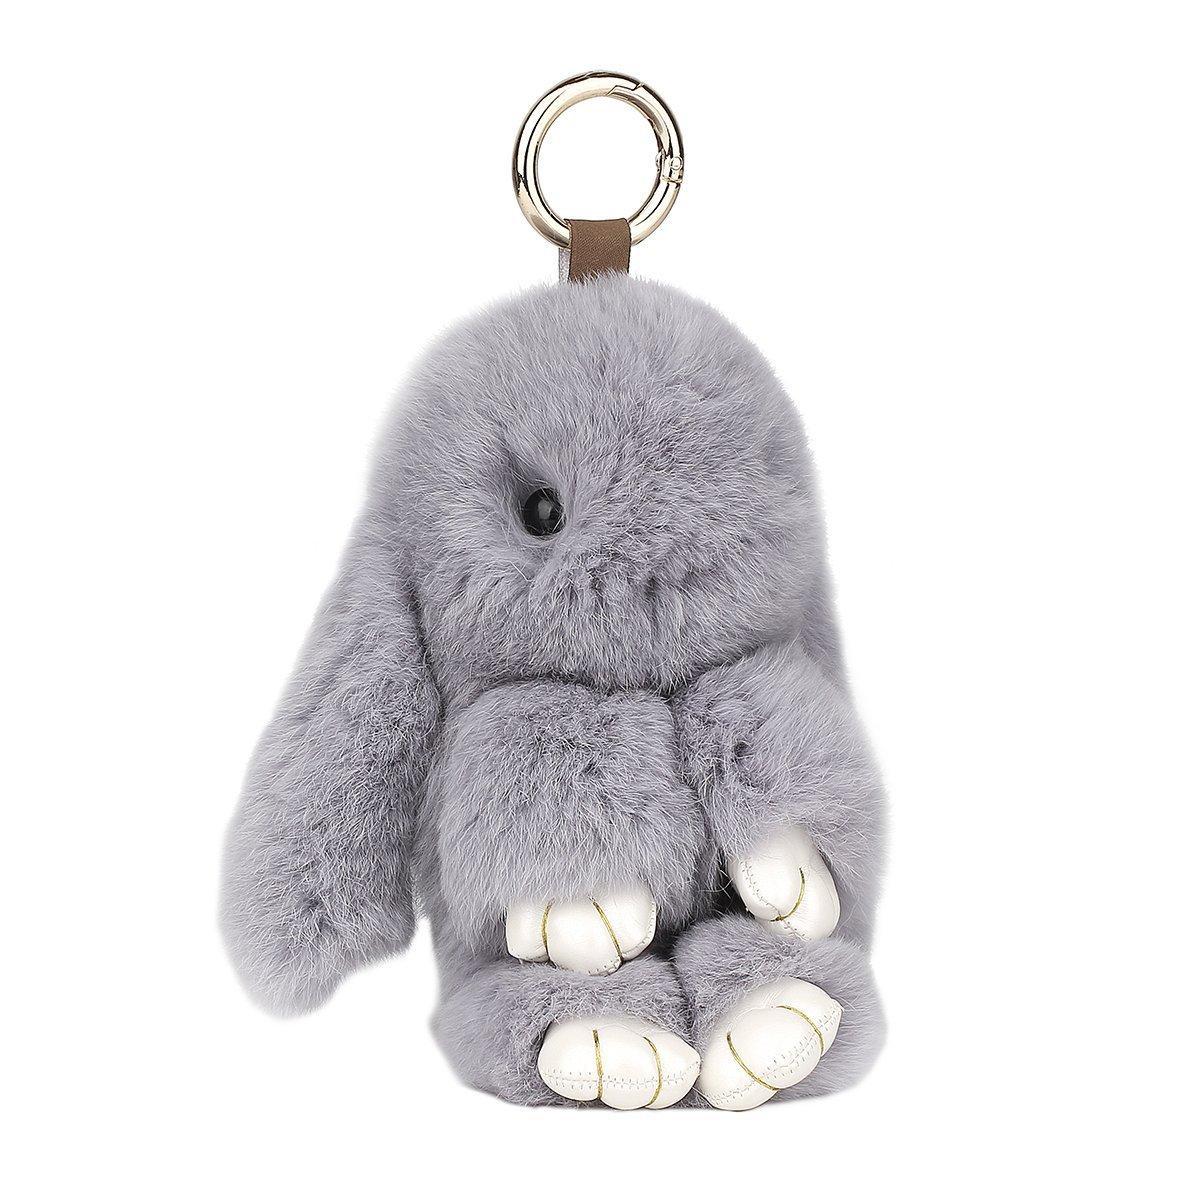 PONOBO Bunny Keychain Soft Rex Rabbit Fur Keychain Car Keyring Women Handbag Charms